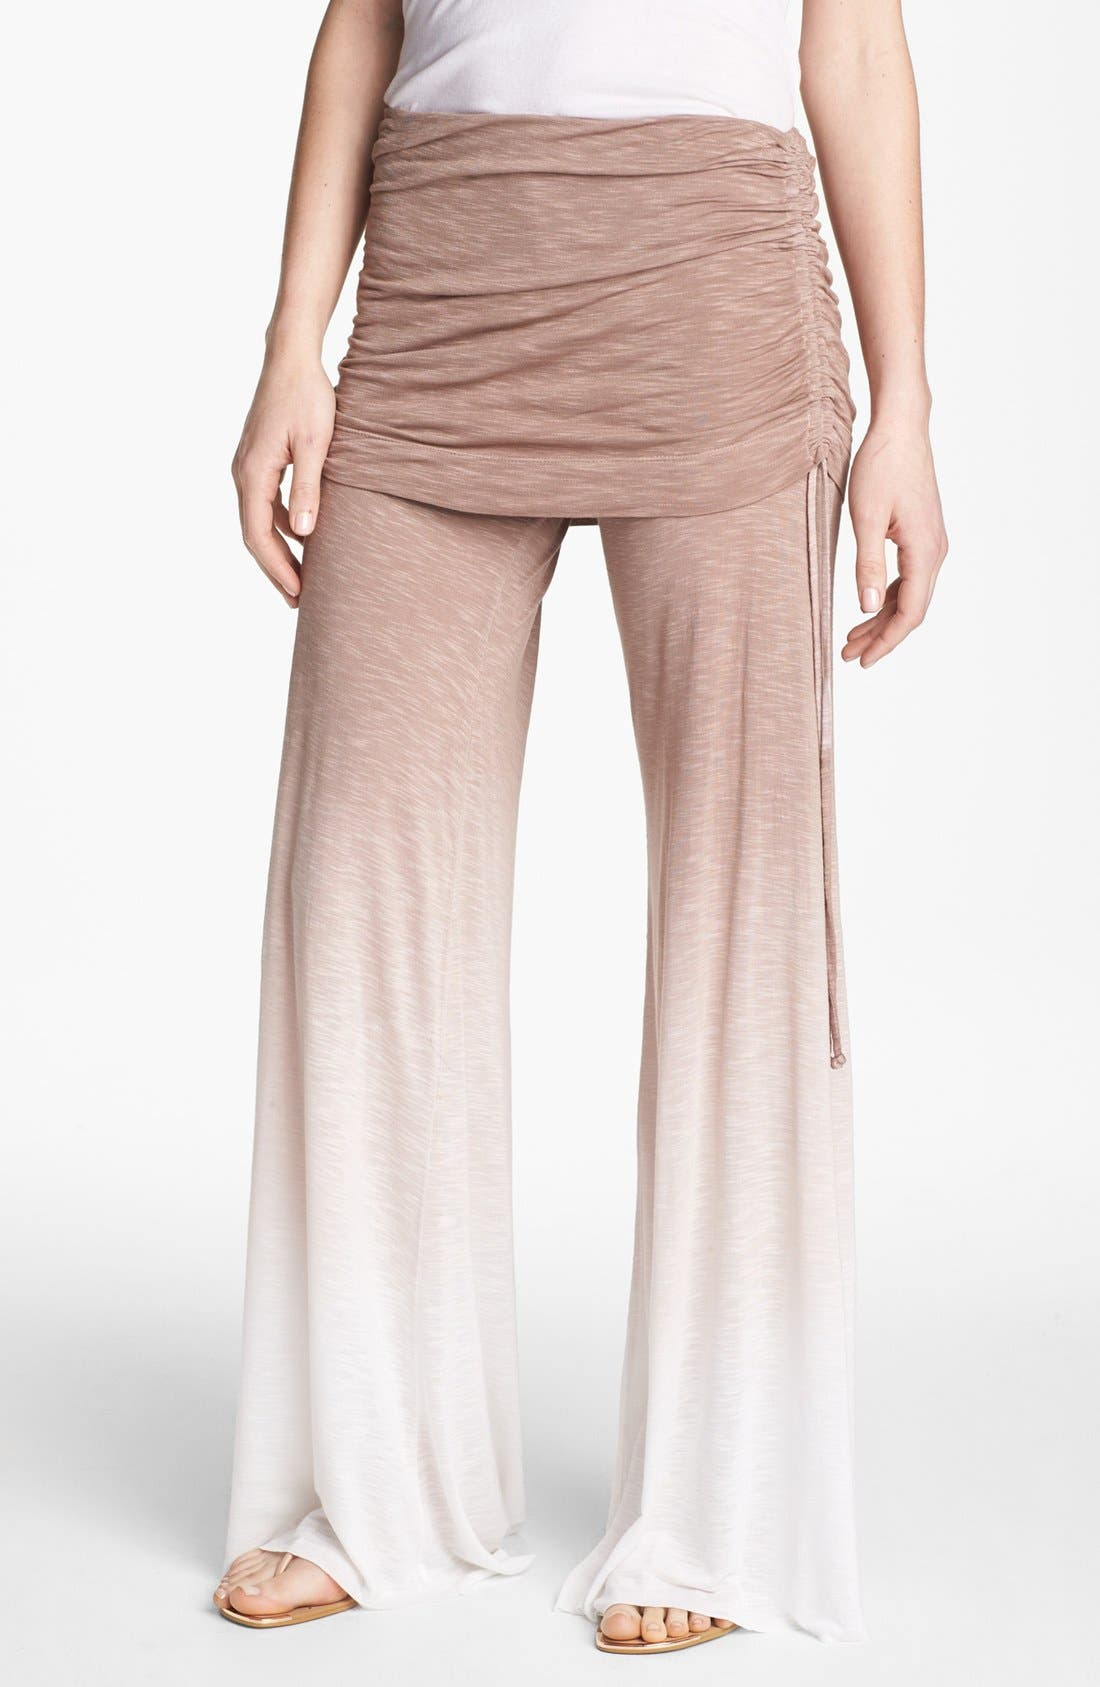 Alternate Image 1 Selected - Young, Fabulous & Broke 'Sierra' Ruched Wide Leg Pants